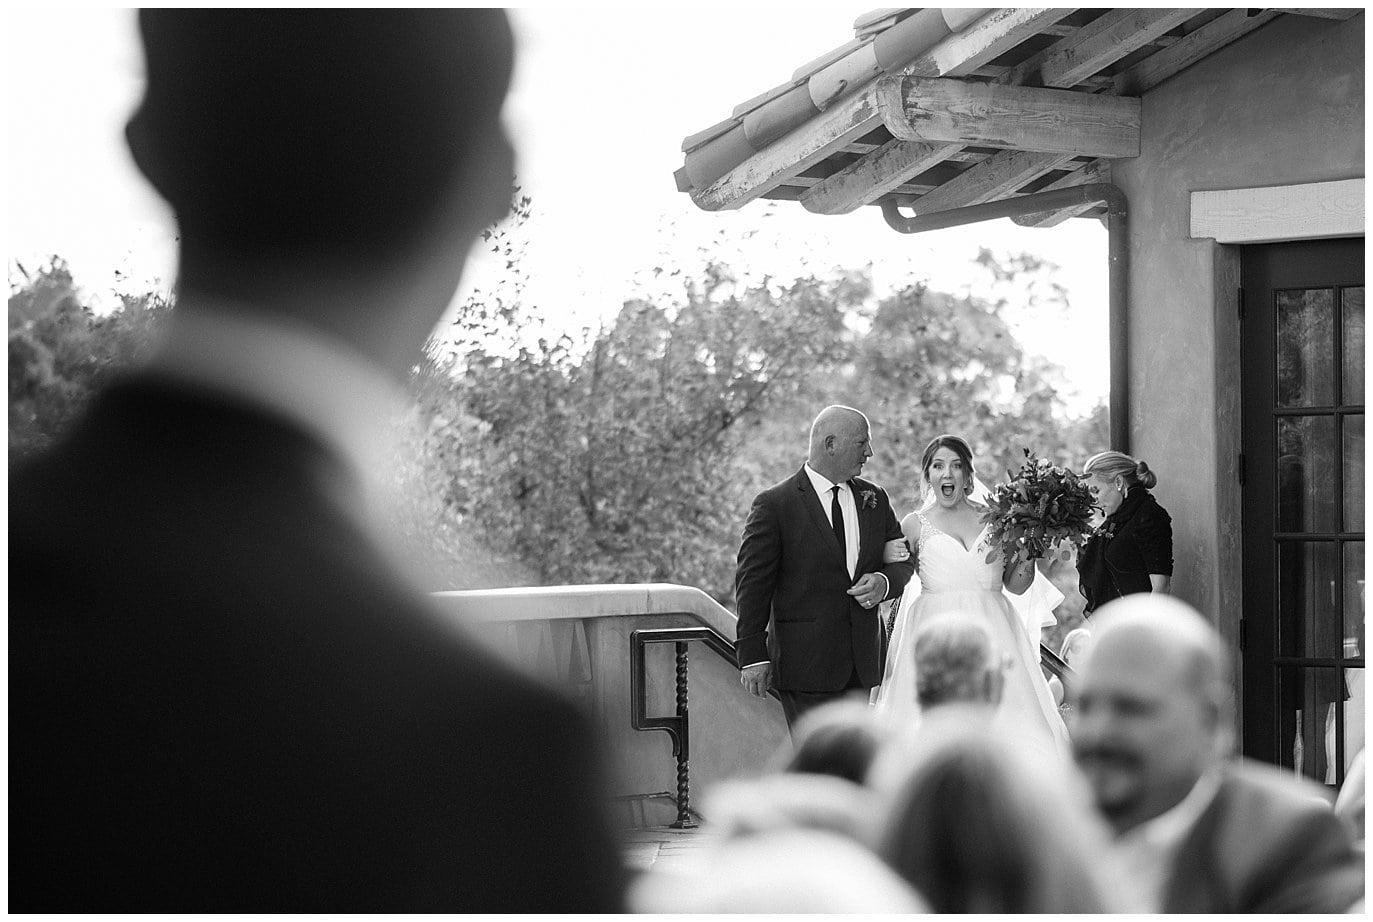 excited bride California wedding ceremony photo